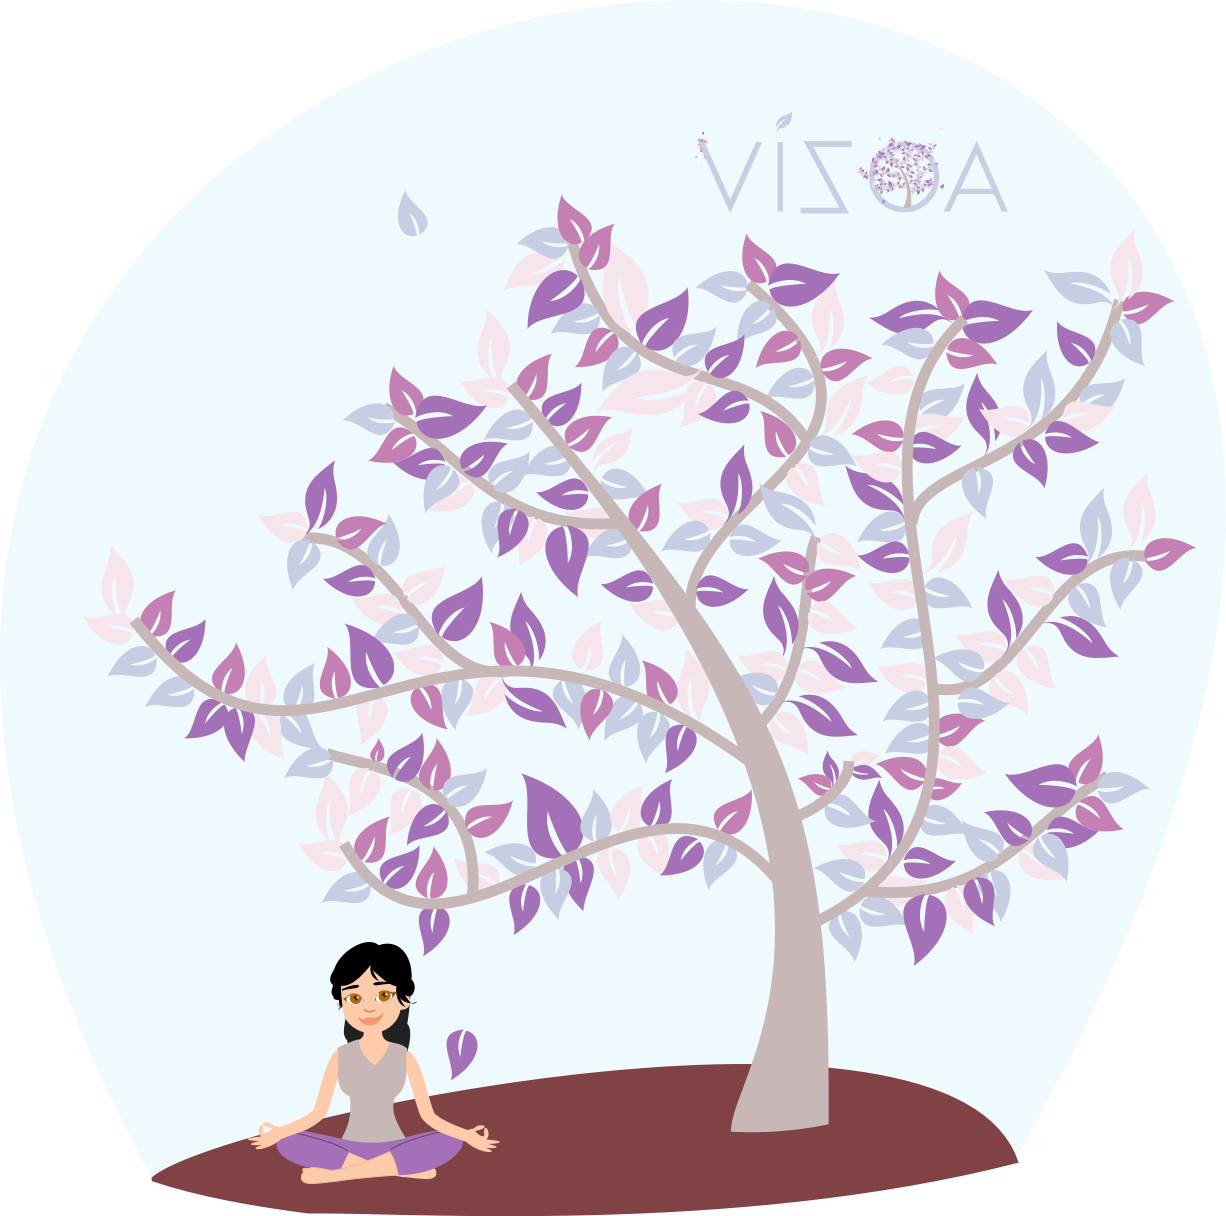 o2style post vizoa méditation